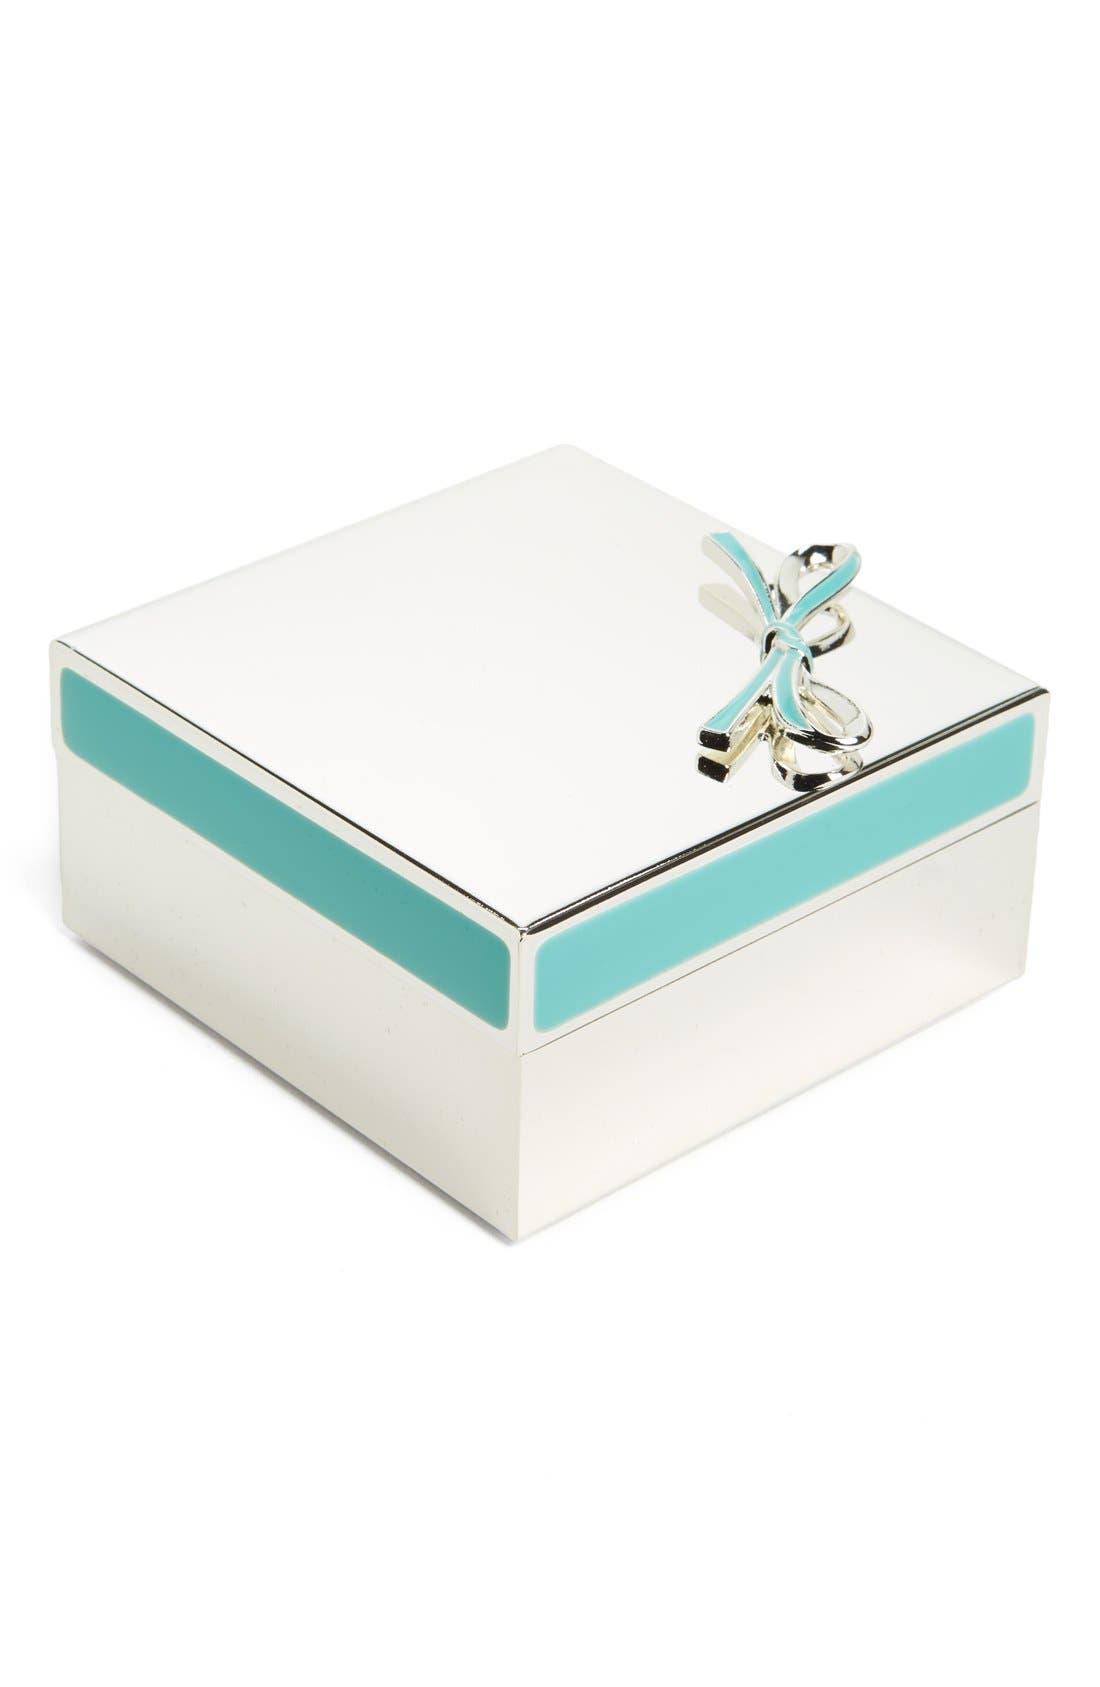 'vienna lane' keepsake box,                         Main,                         color, Turquoise